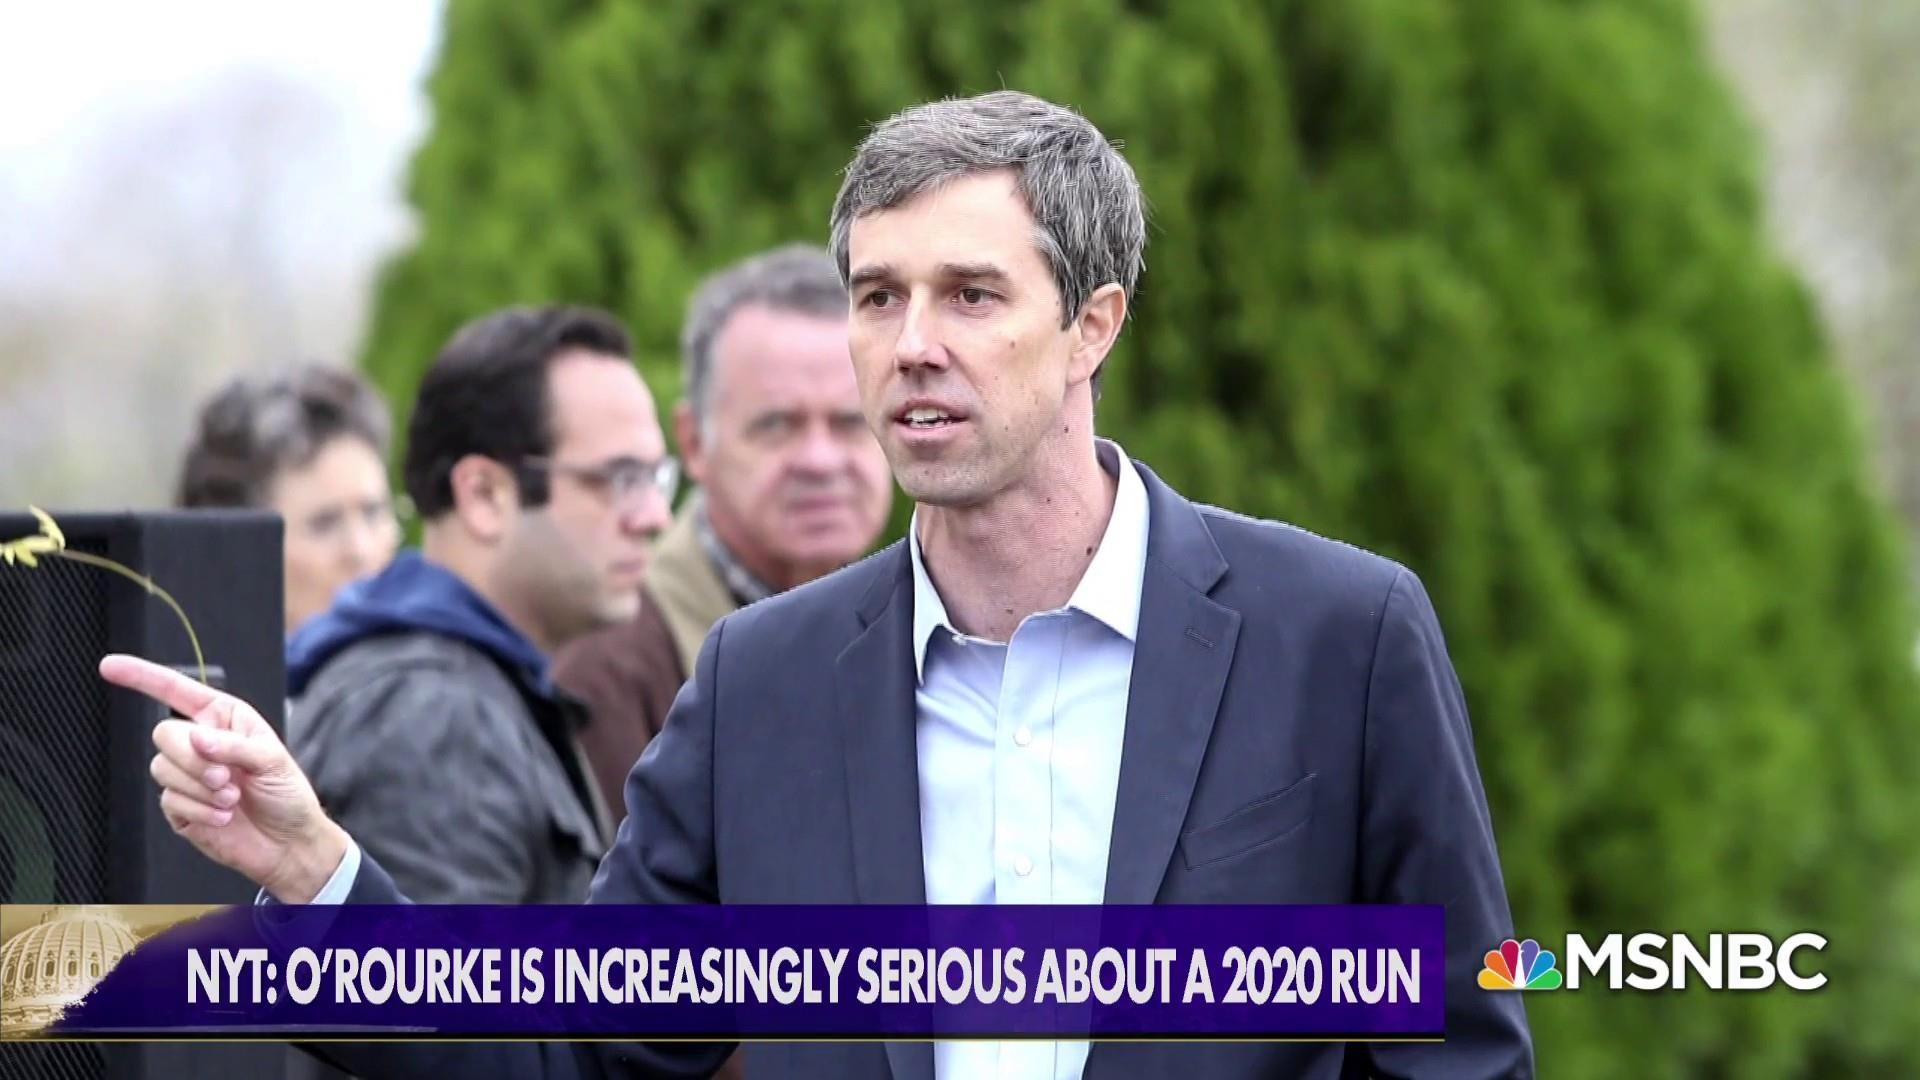 2020 presidential race: Comey won't run, O'Rourke increasingly serious